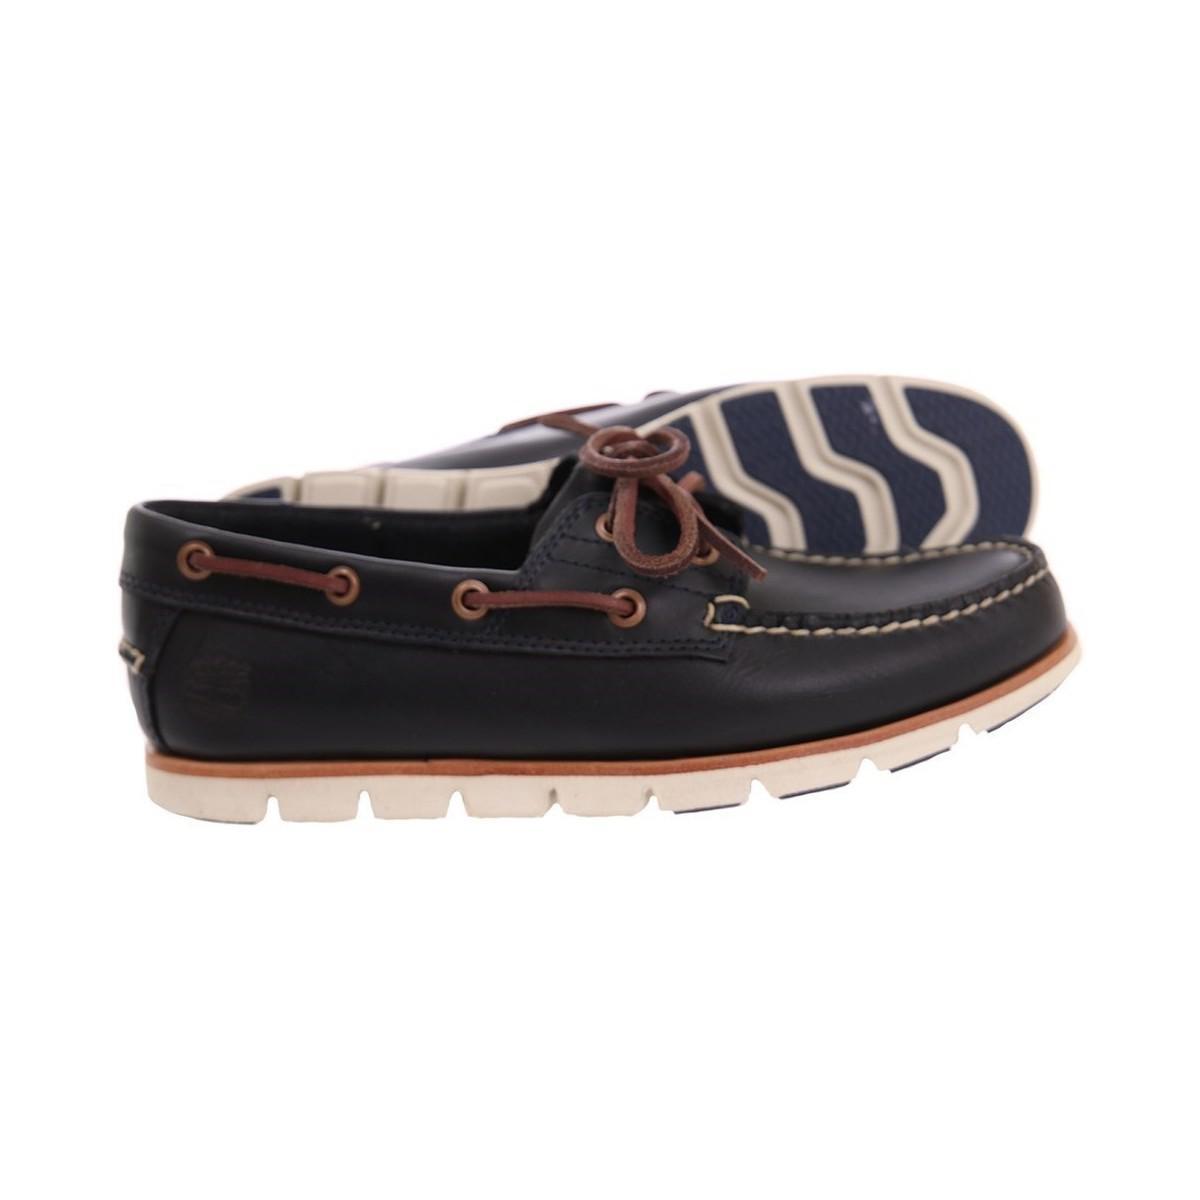 a8ad77efd Timberland Tidelands 2 Eye Dark Indigo Brando Men s Boat Shoes In ...